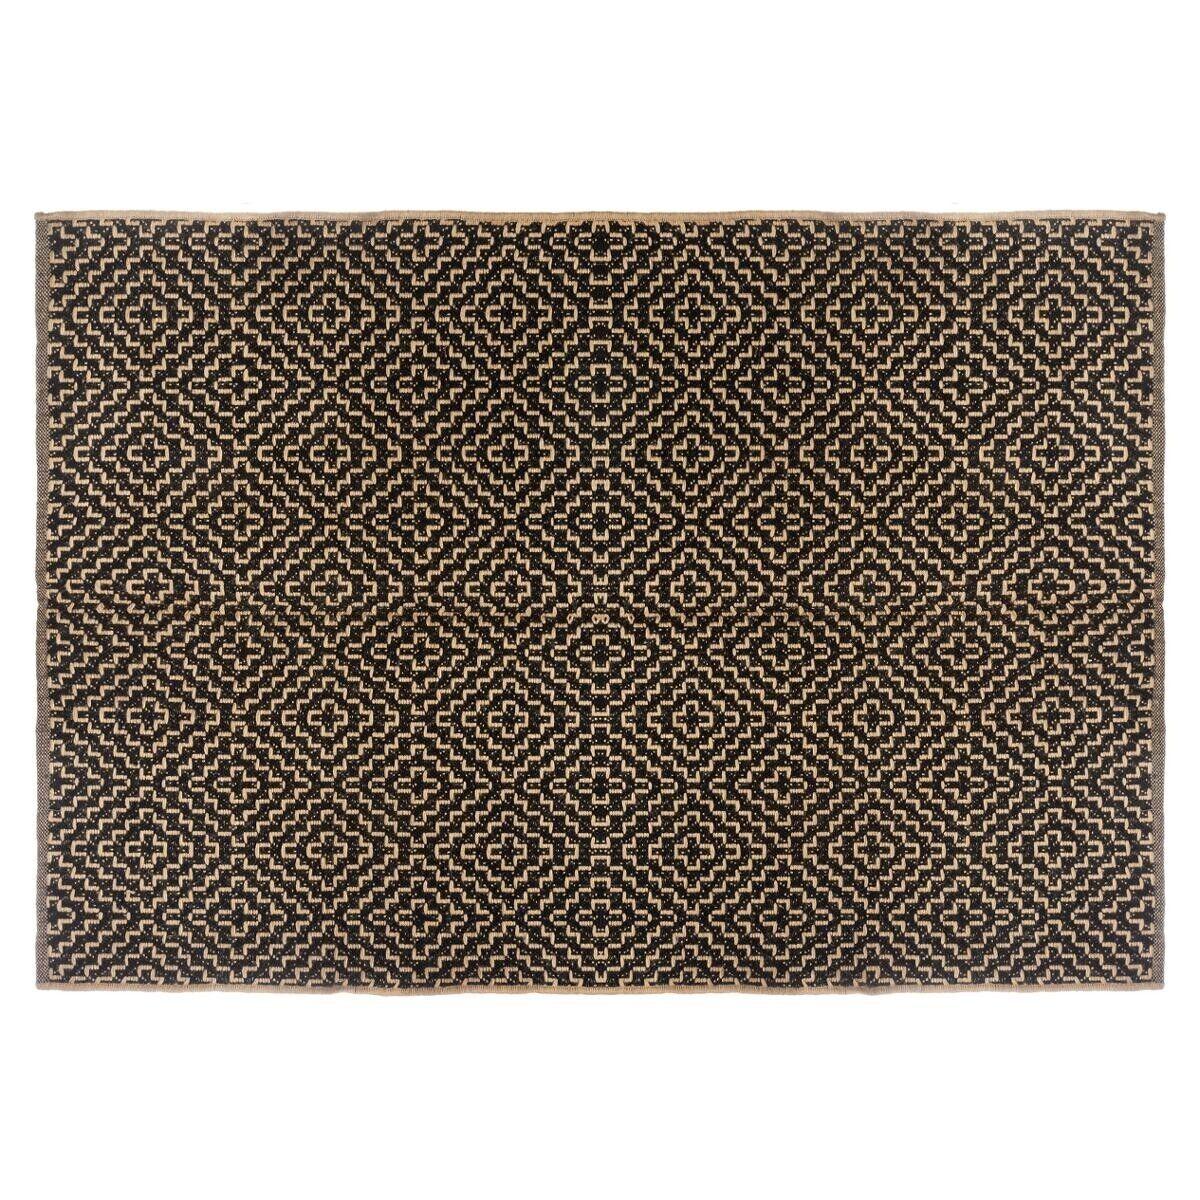 Atmosphera Tapis noir en jute coton 120x170 cm